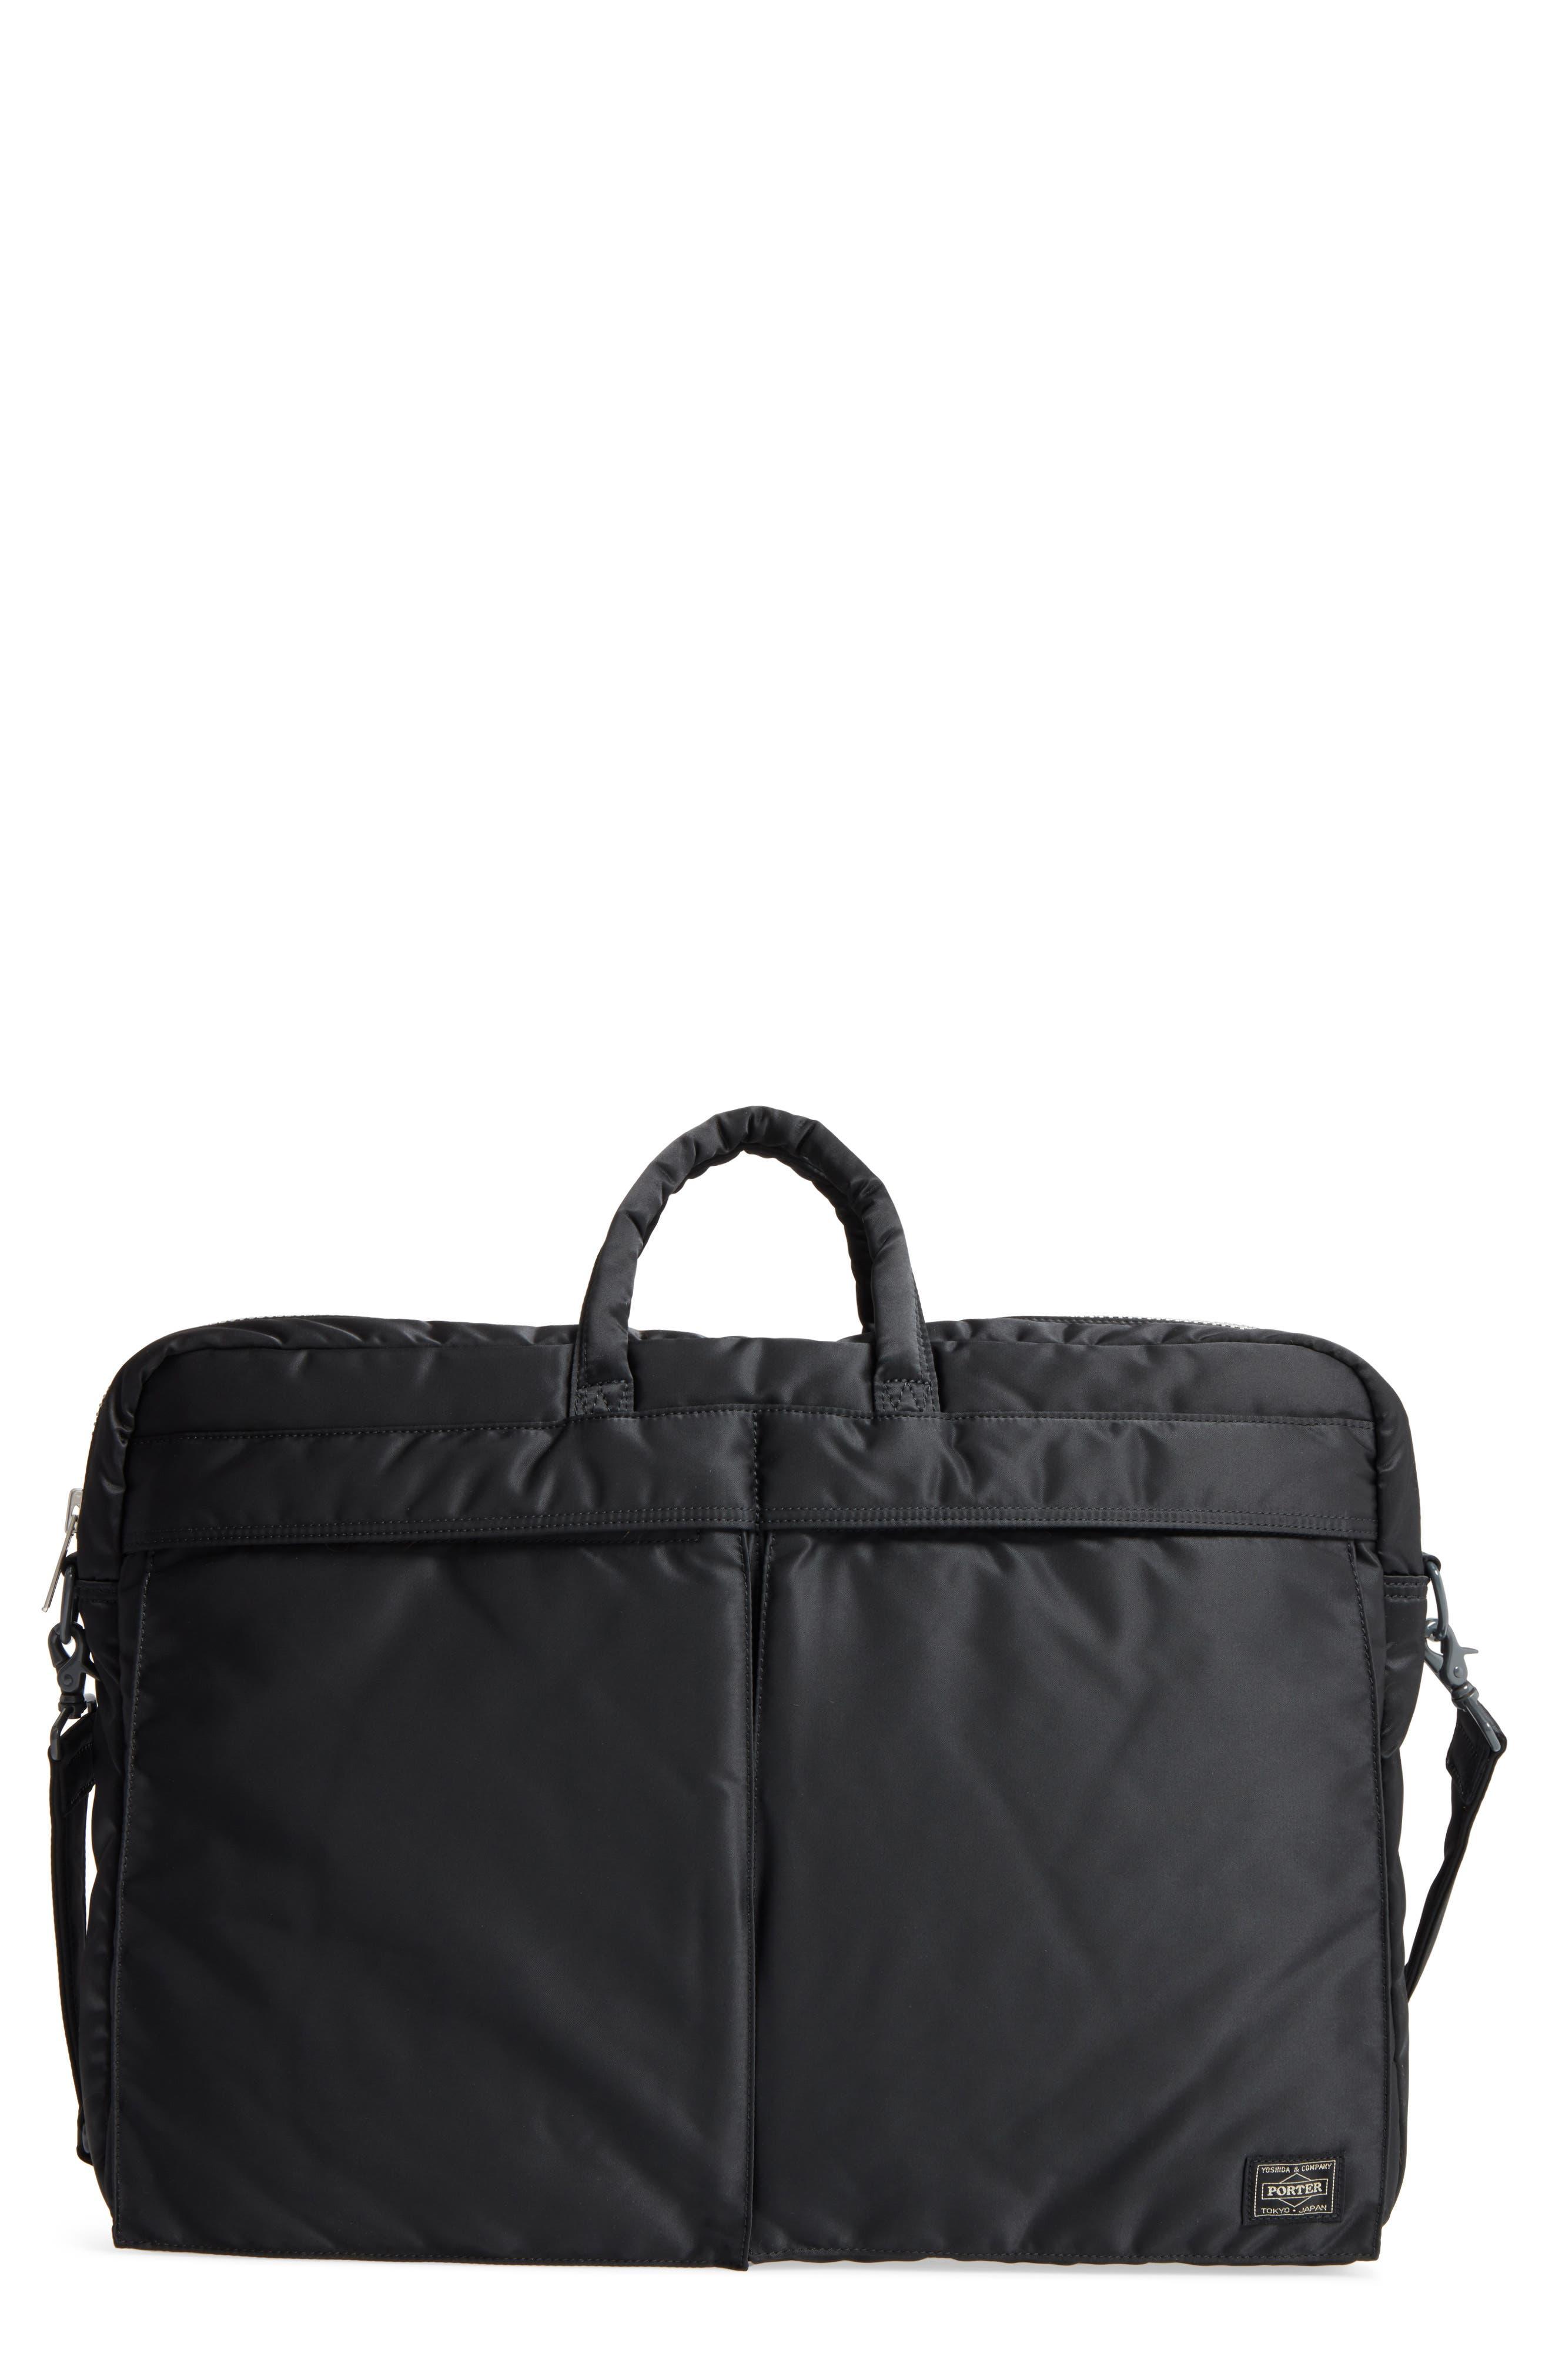 Porter-Yoshida & Co. Tanker Two-Way Briefcase,                         Main,                         color, 001